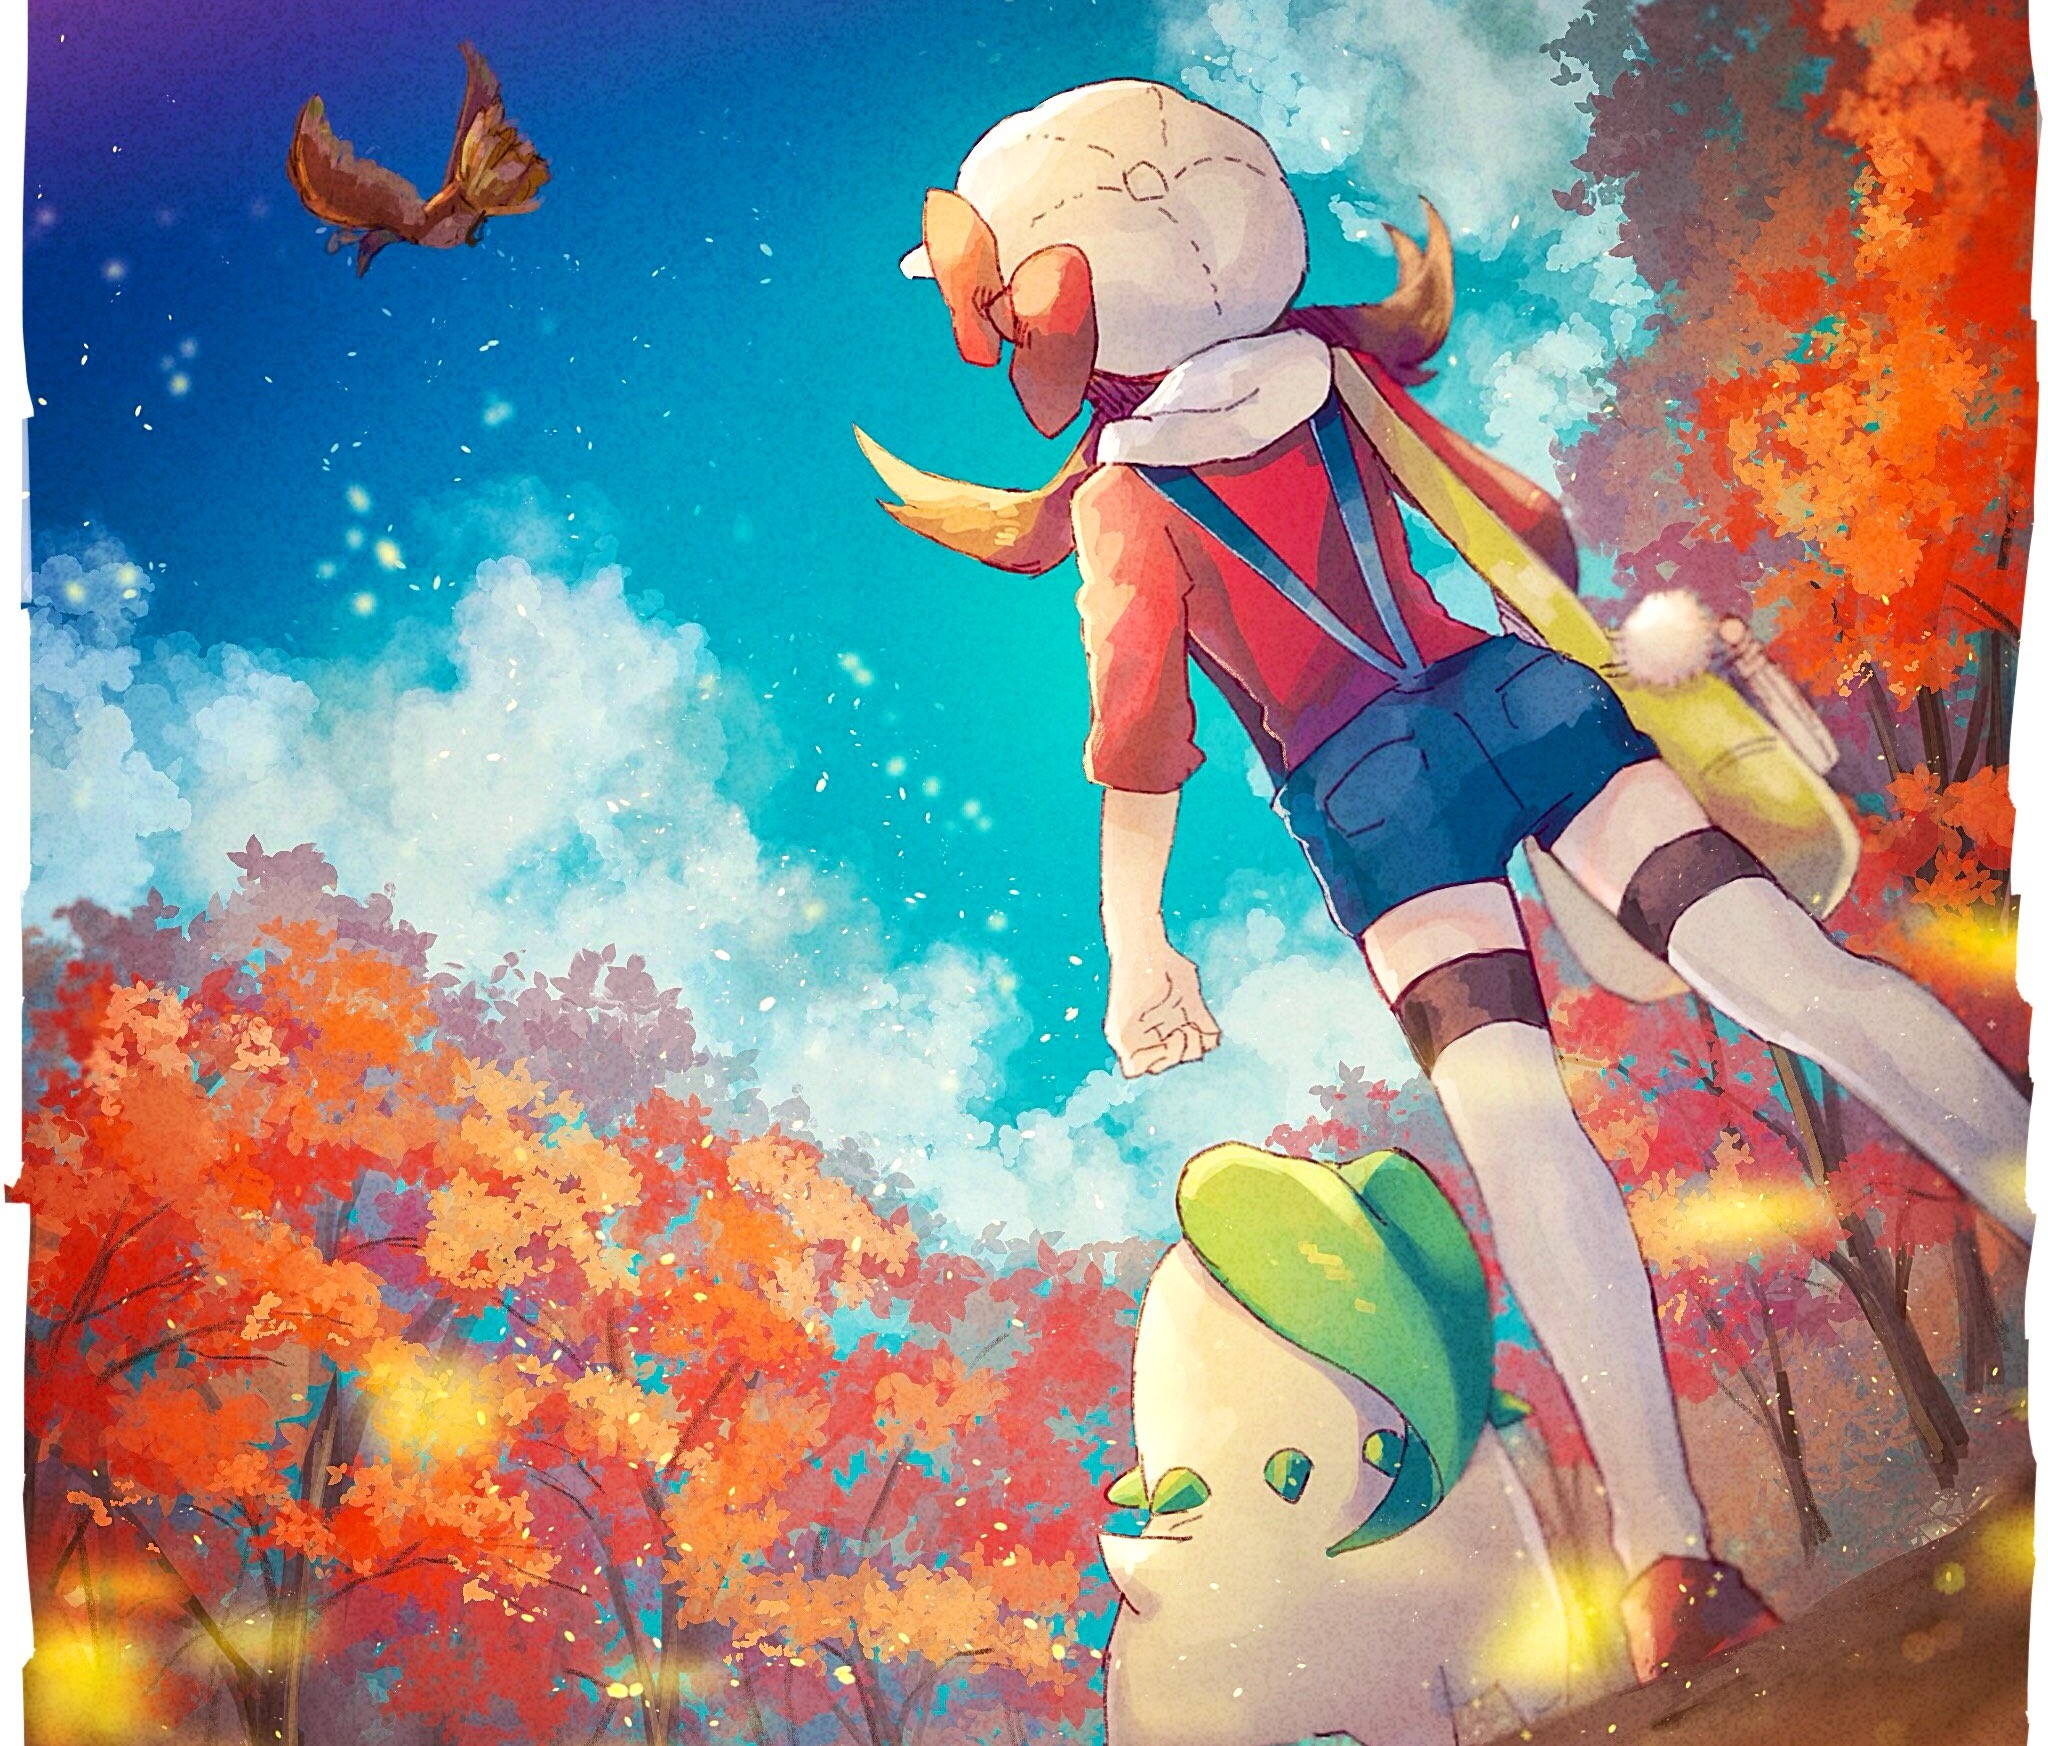 Pokemon Heartgold And Soulsilver Hd Wallpaper Background Image